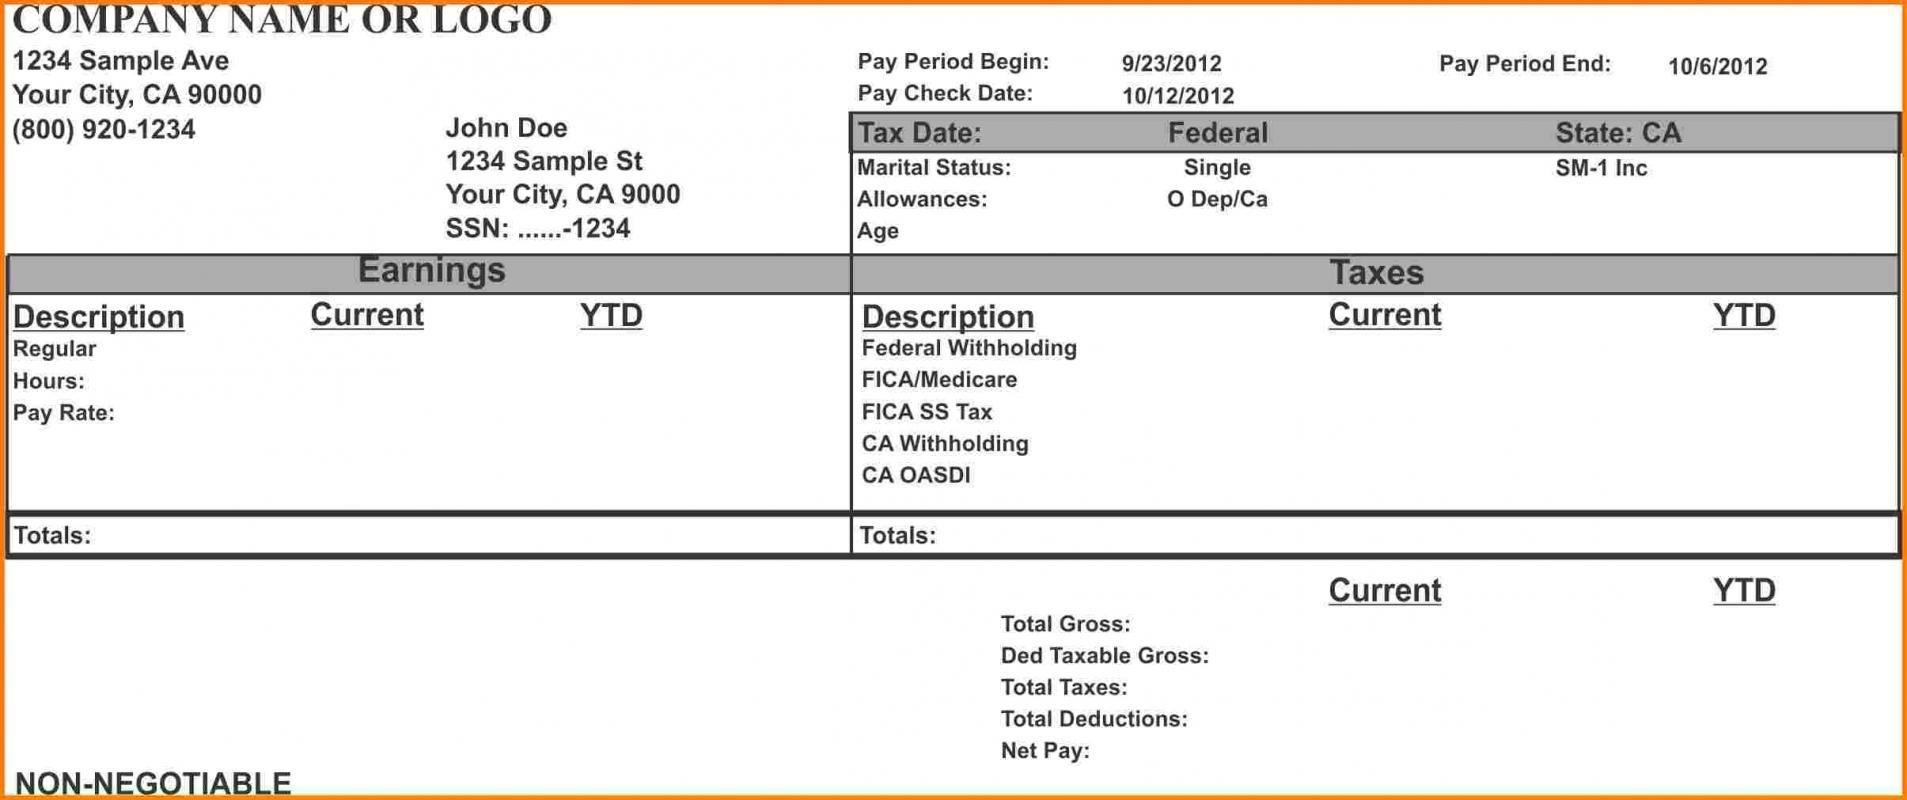 000 Wondrou Pay Stub Template Word Idea  Document Check Microsoft FreeFull